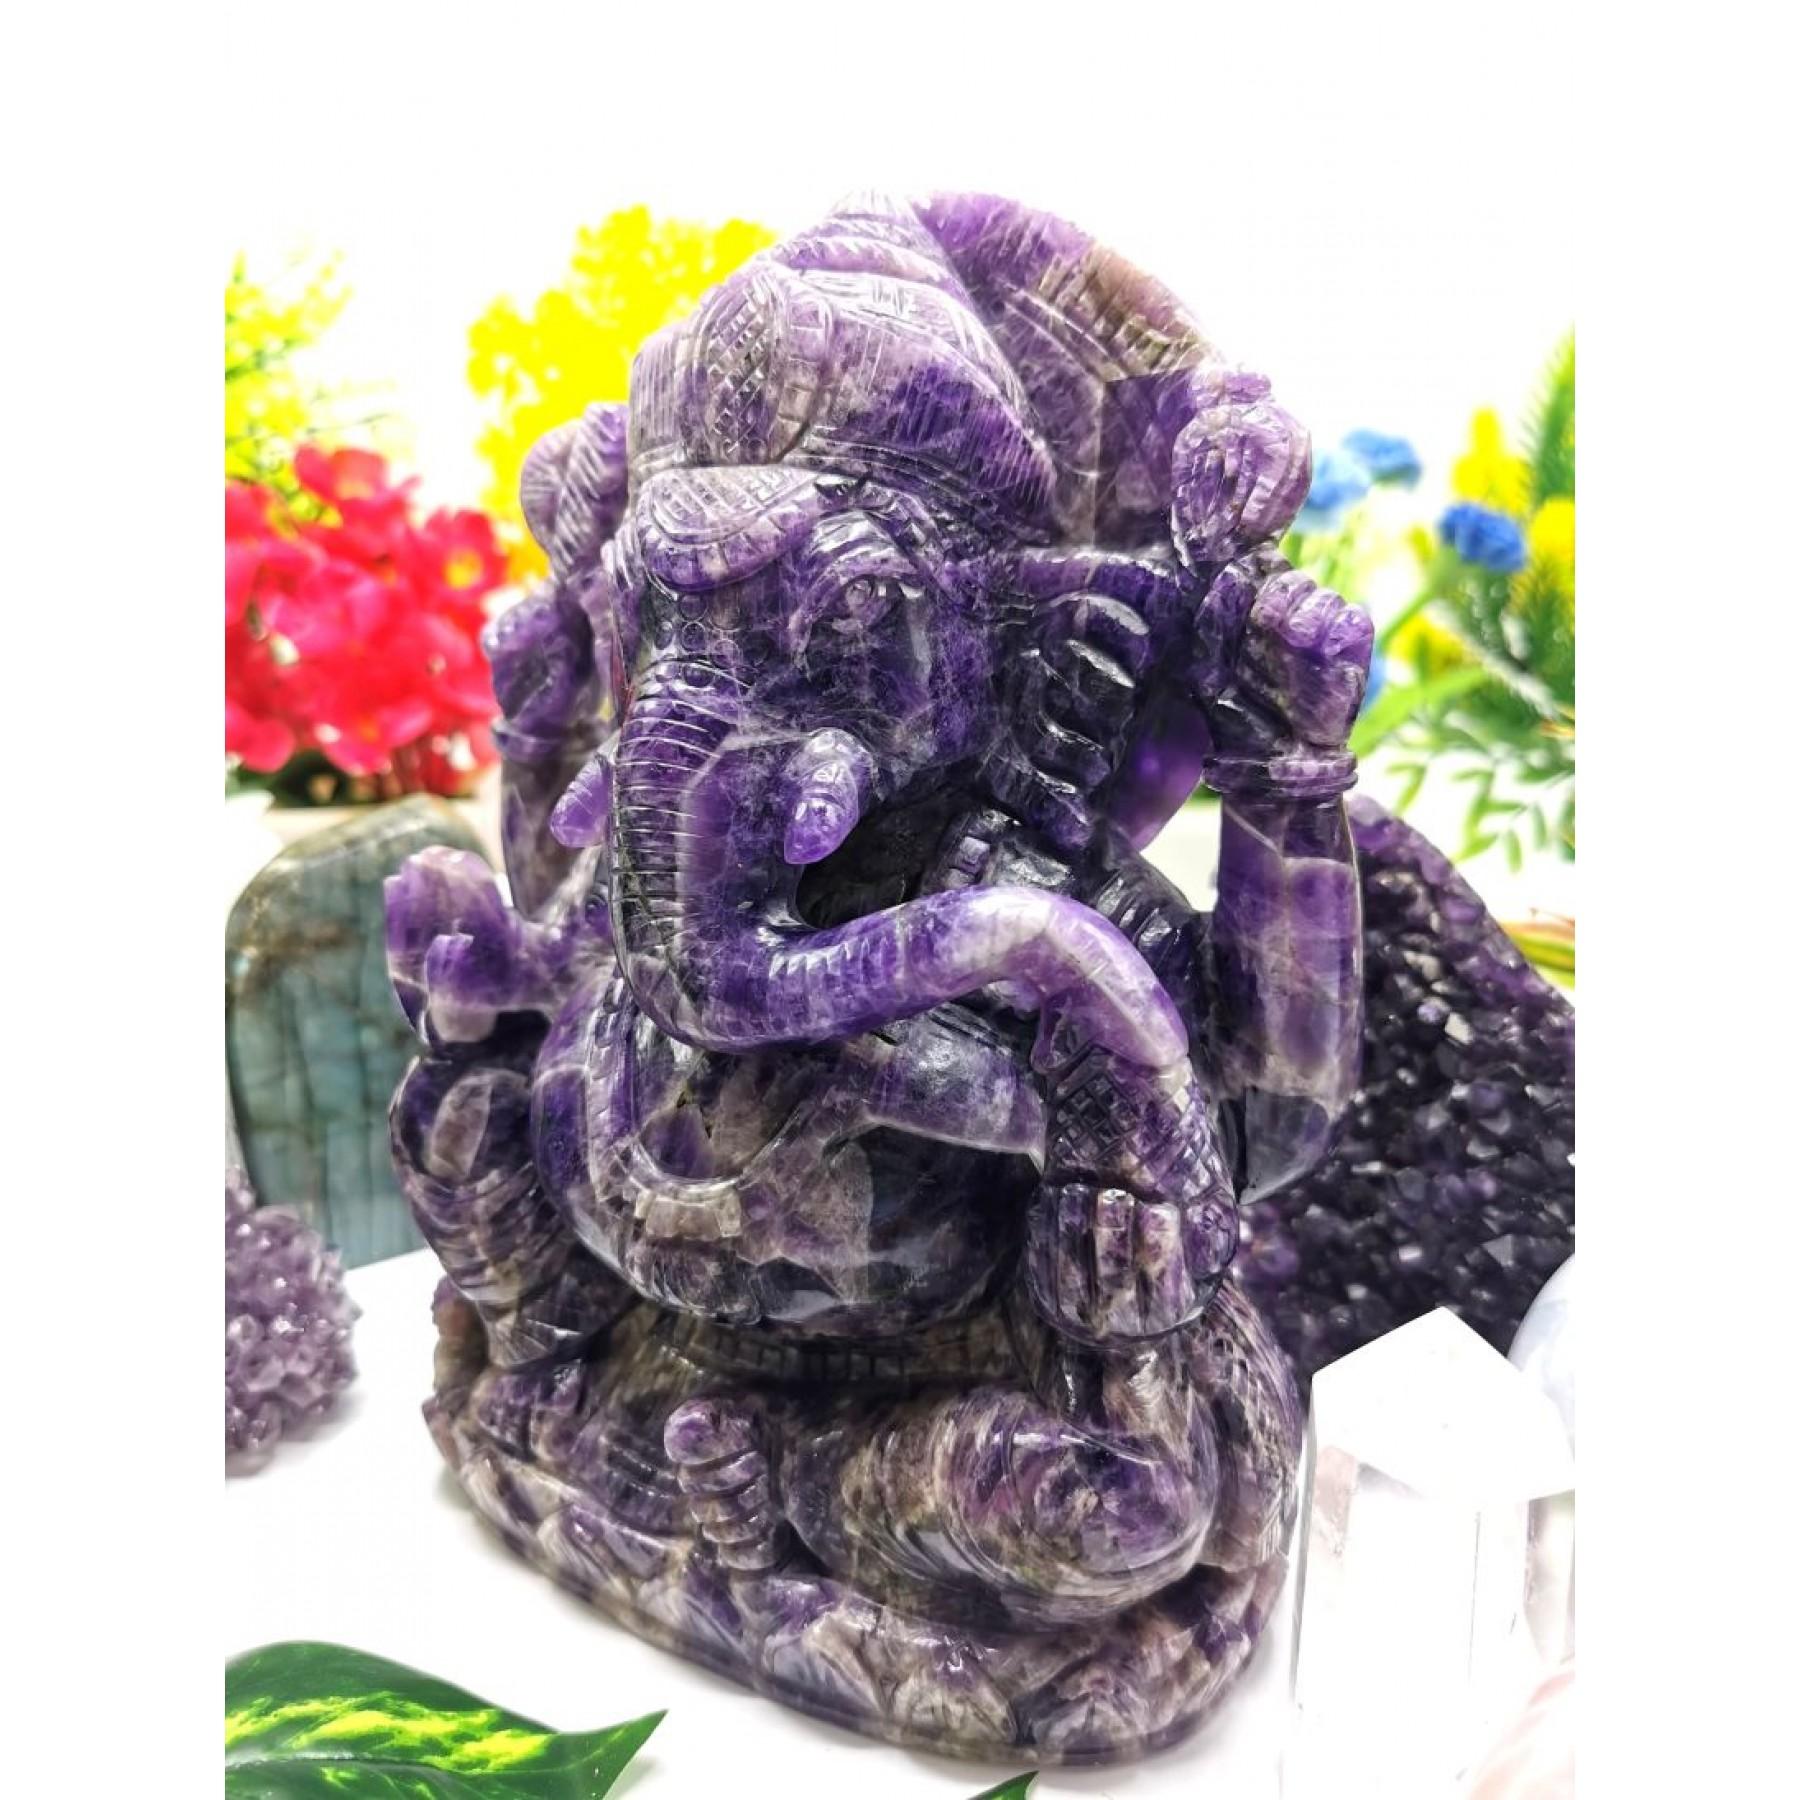 Office Gifts Amethys Ganesha Statue for Home Ganesha Figurine Car